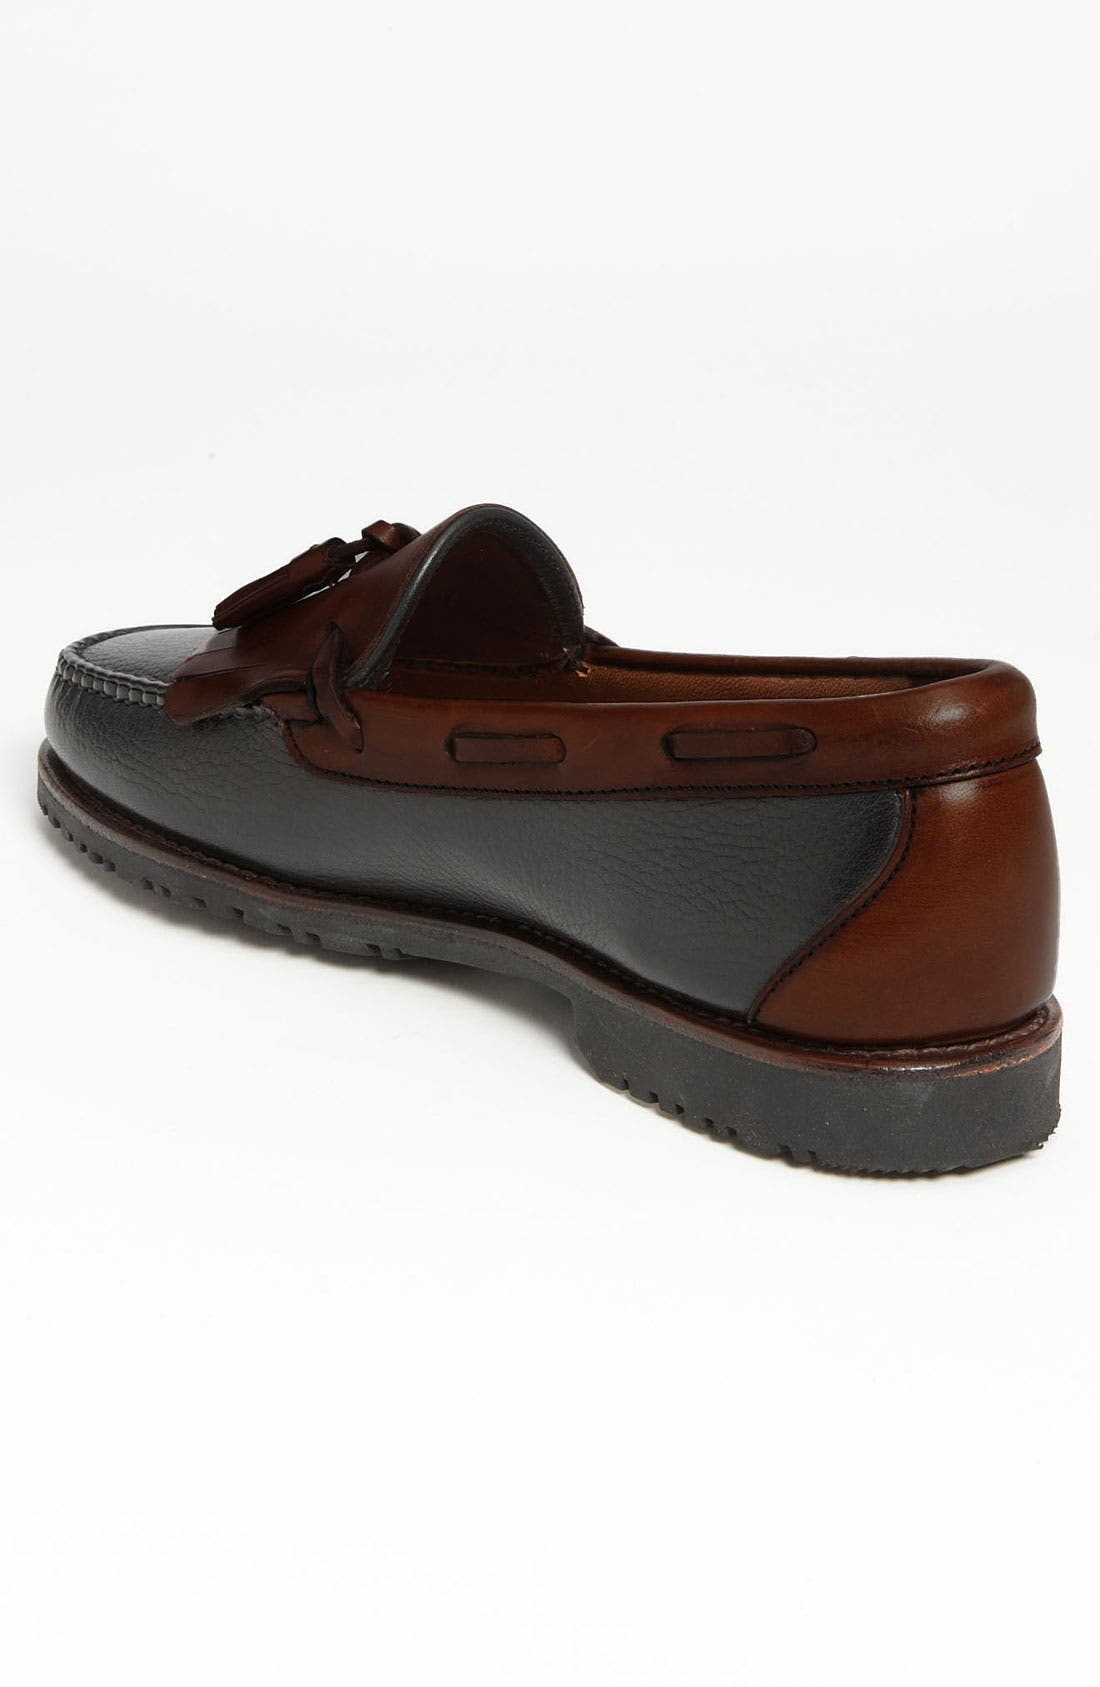 'Nashua' Tassel Loafer,                             Alternate thumbnail 2, color,                             Black/ Brown